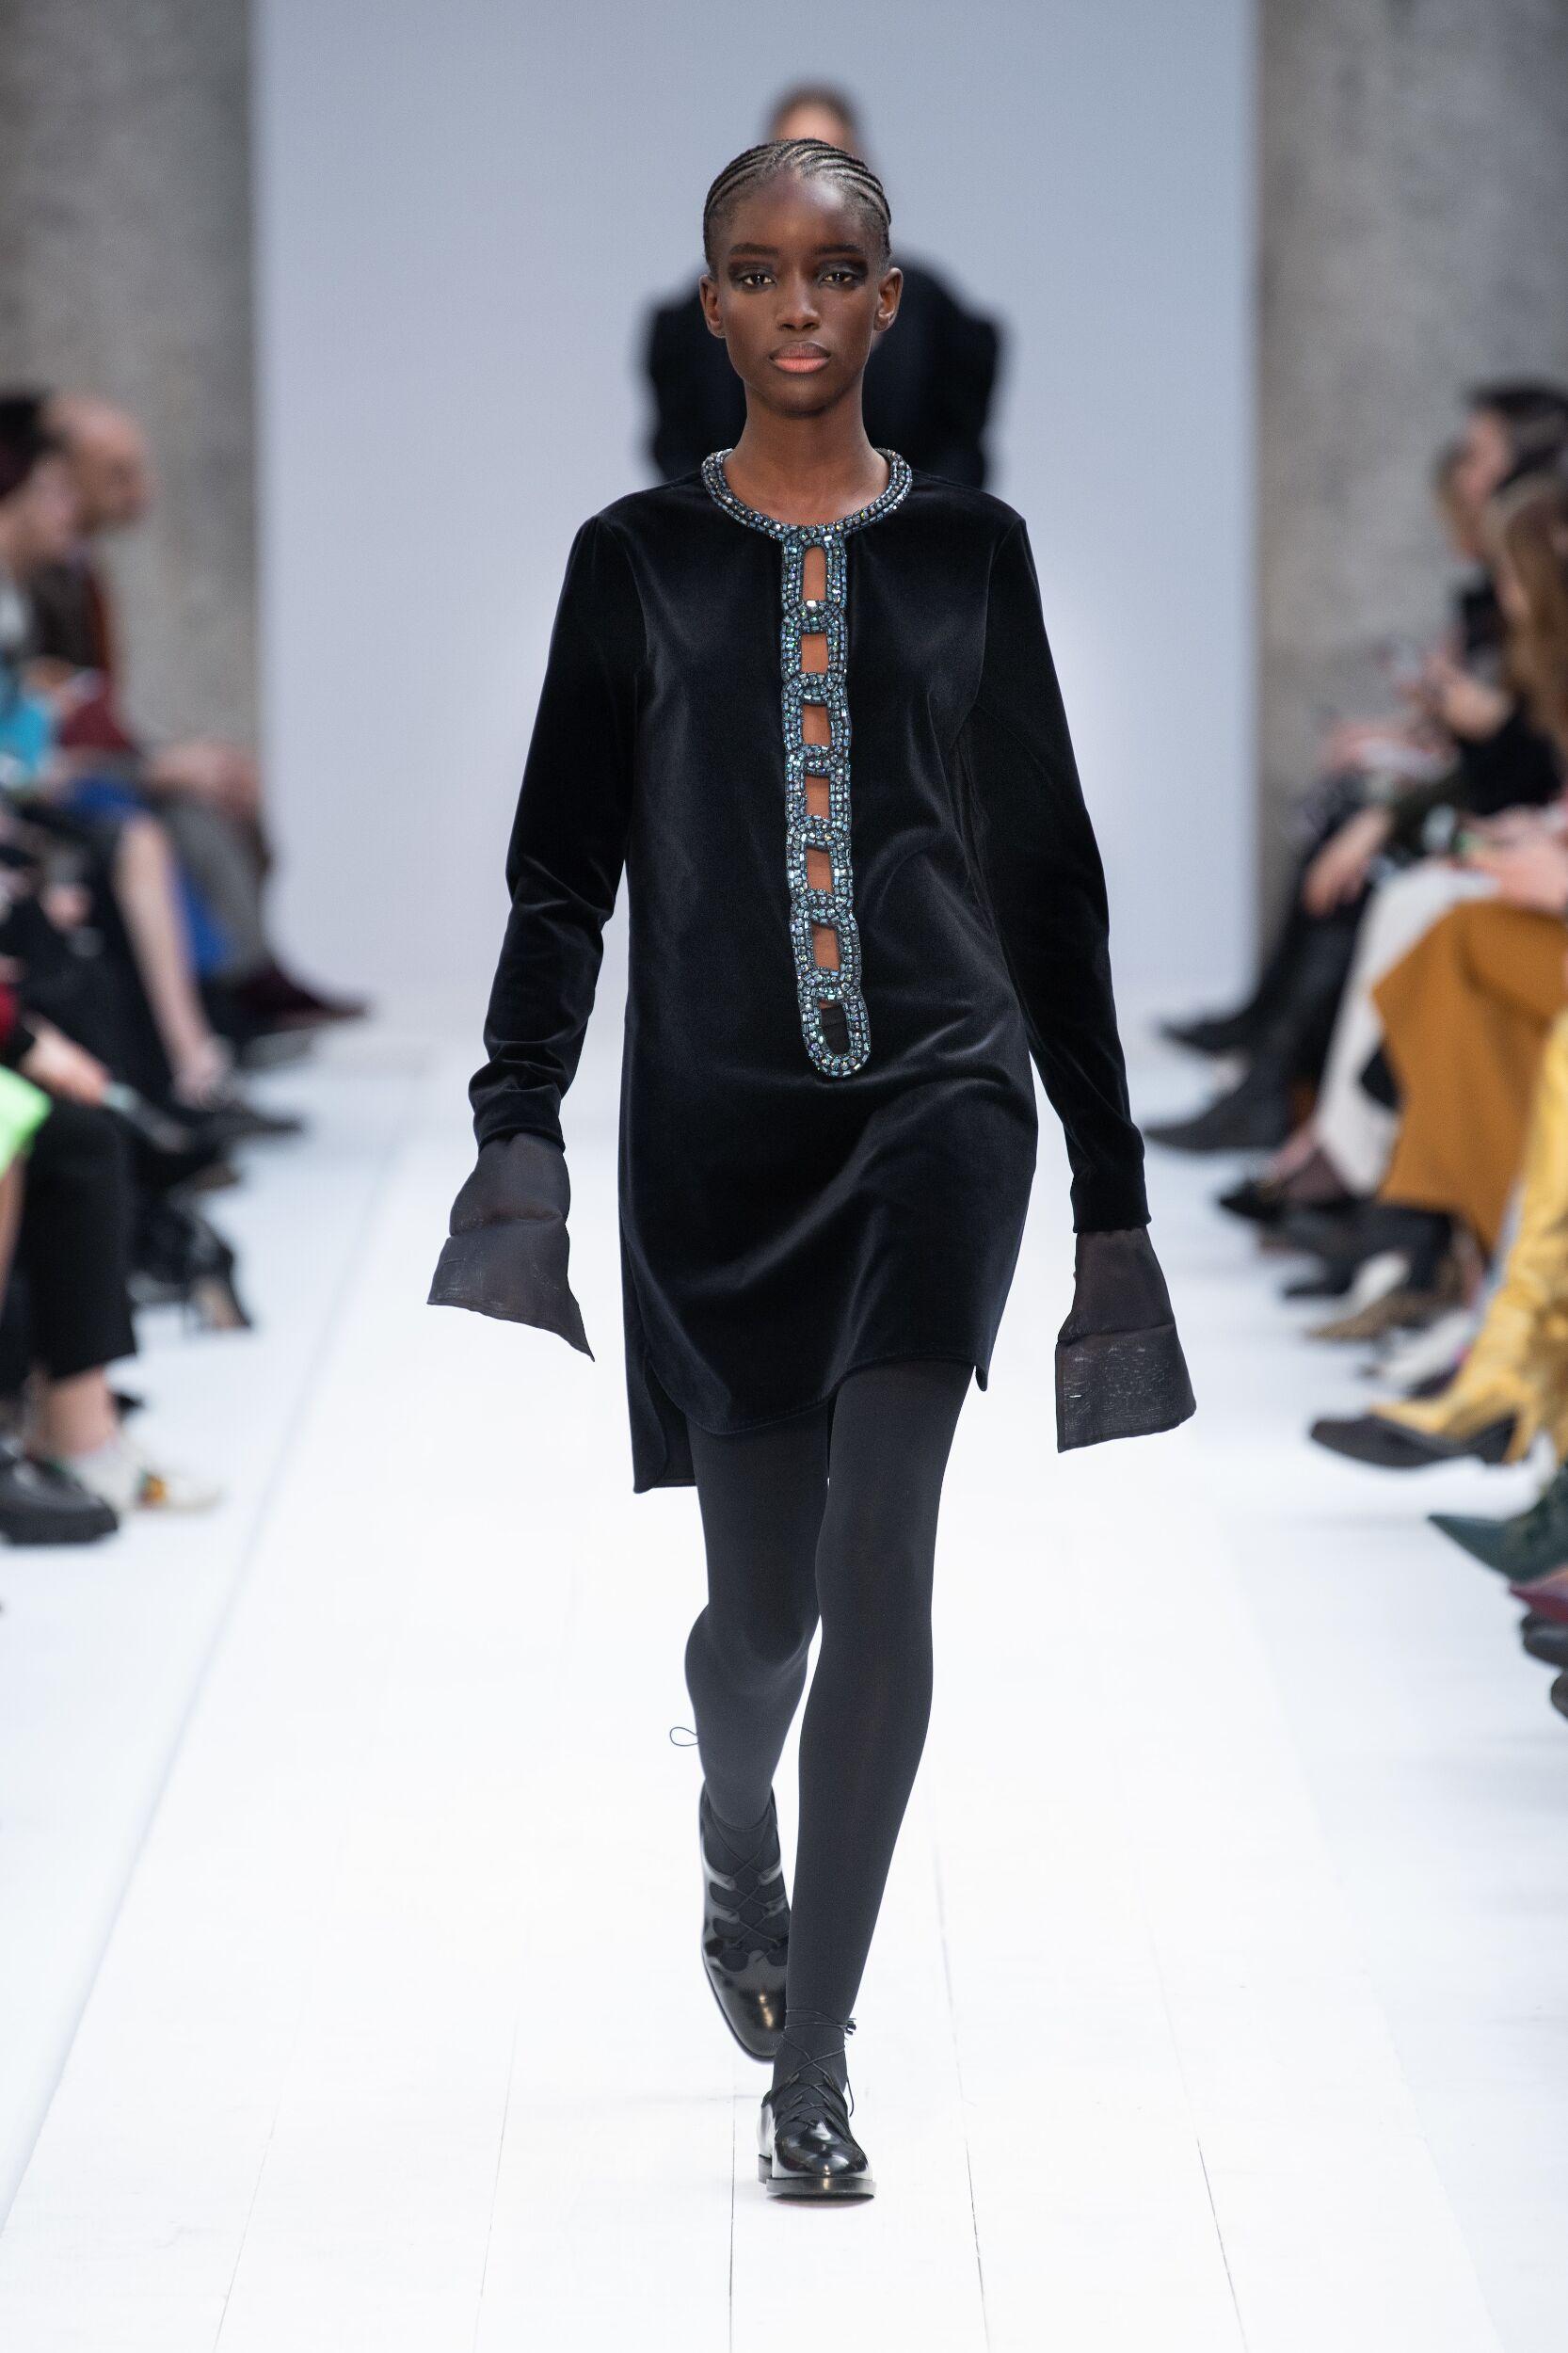 Womenswear Winter Max Mara 2020